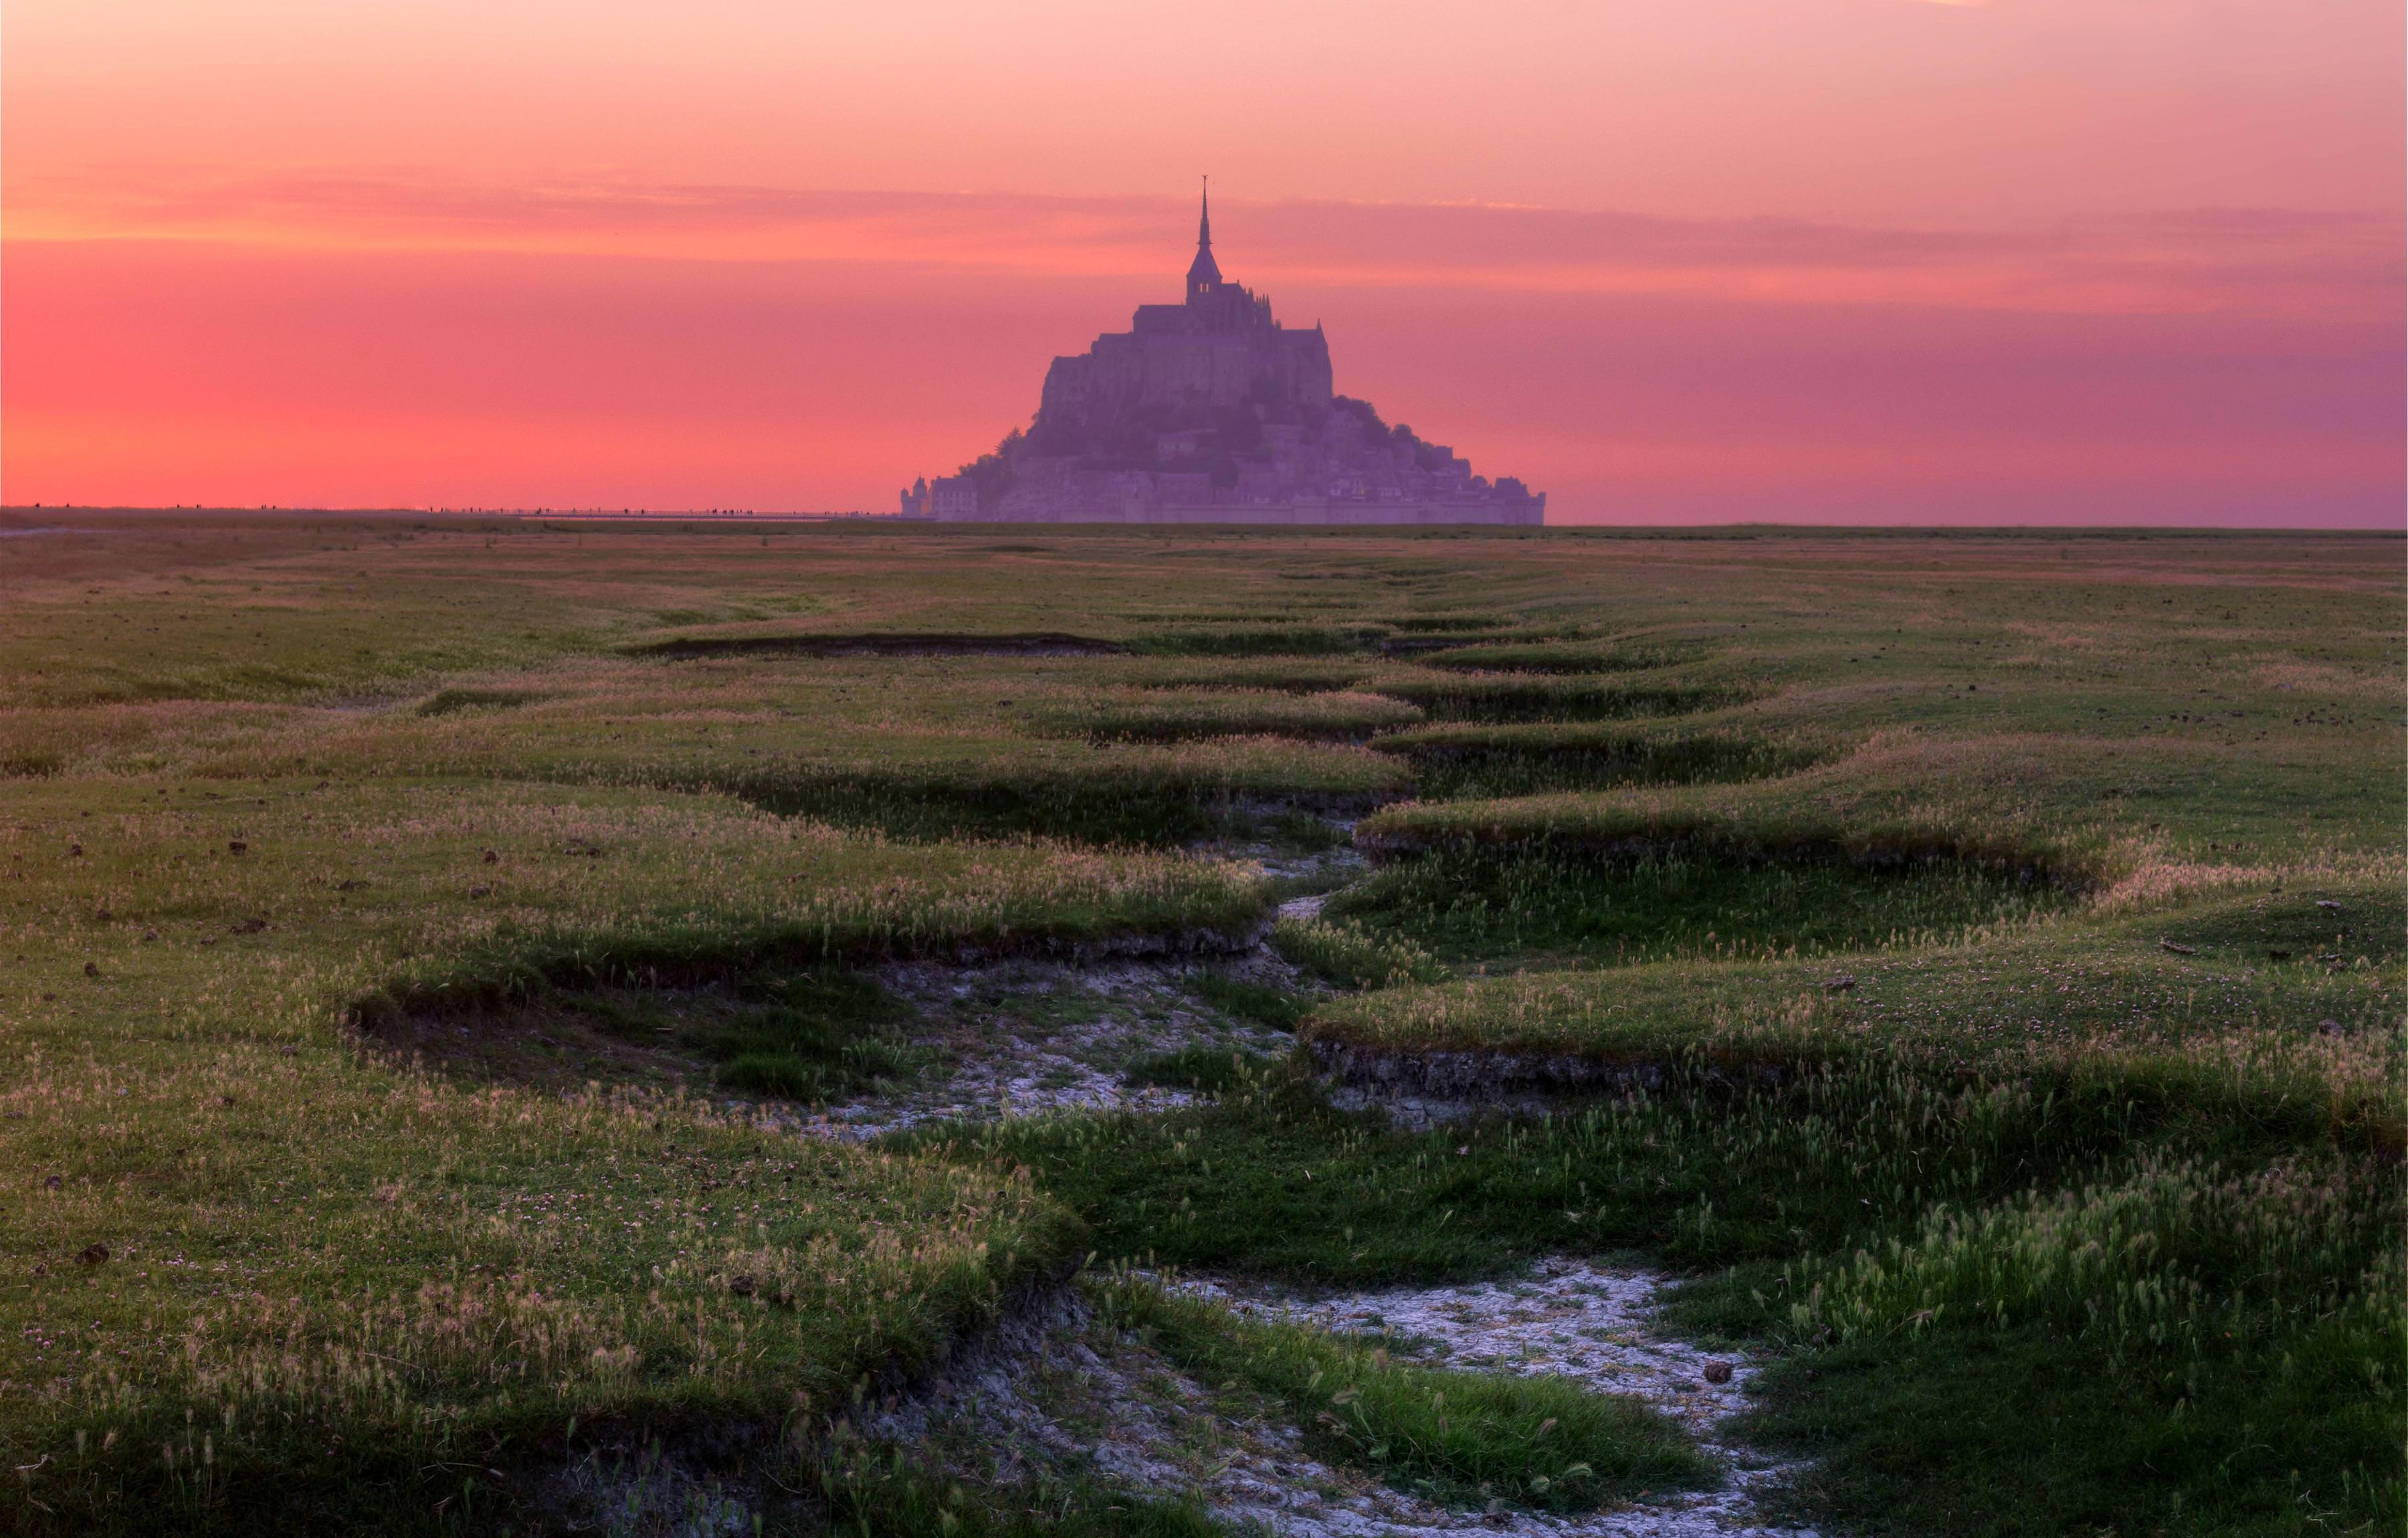 General 3600x2299 castle field Mont Saint-Michel France island landscape Abbey